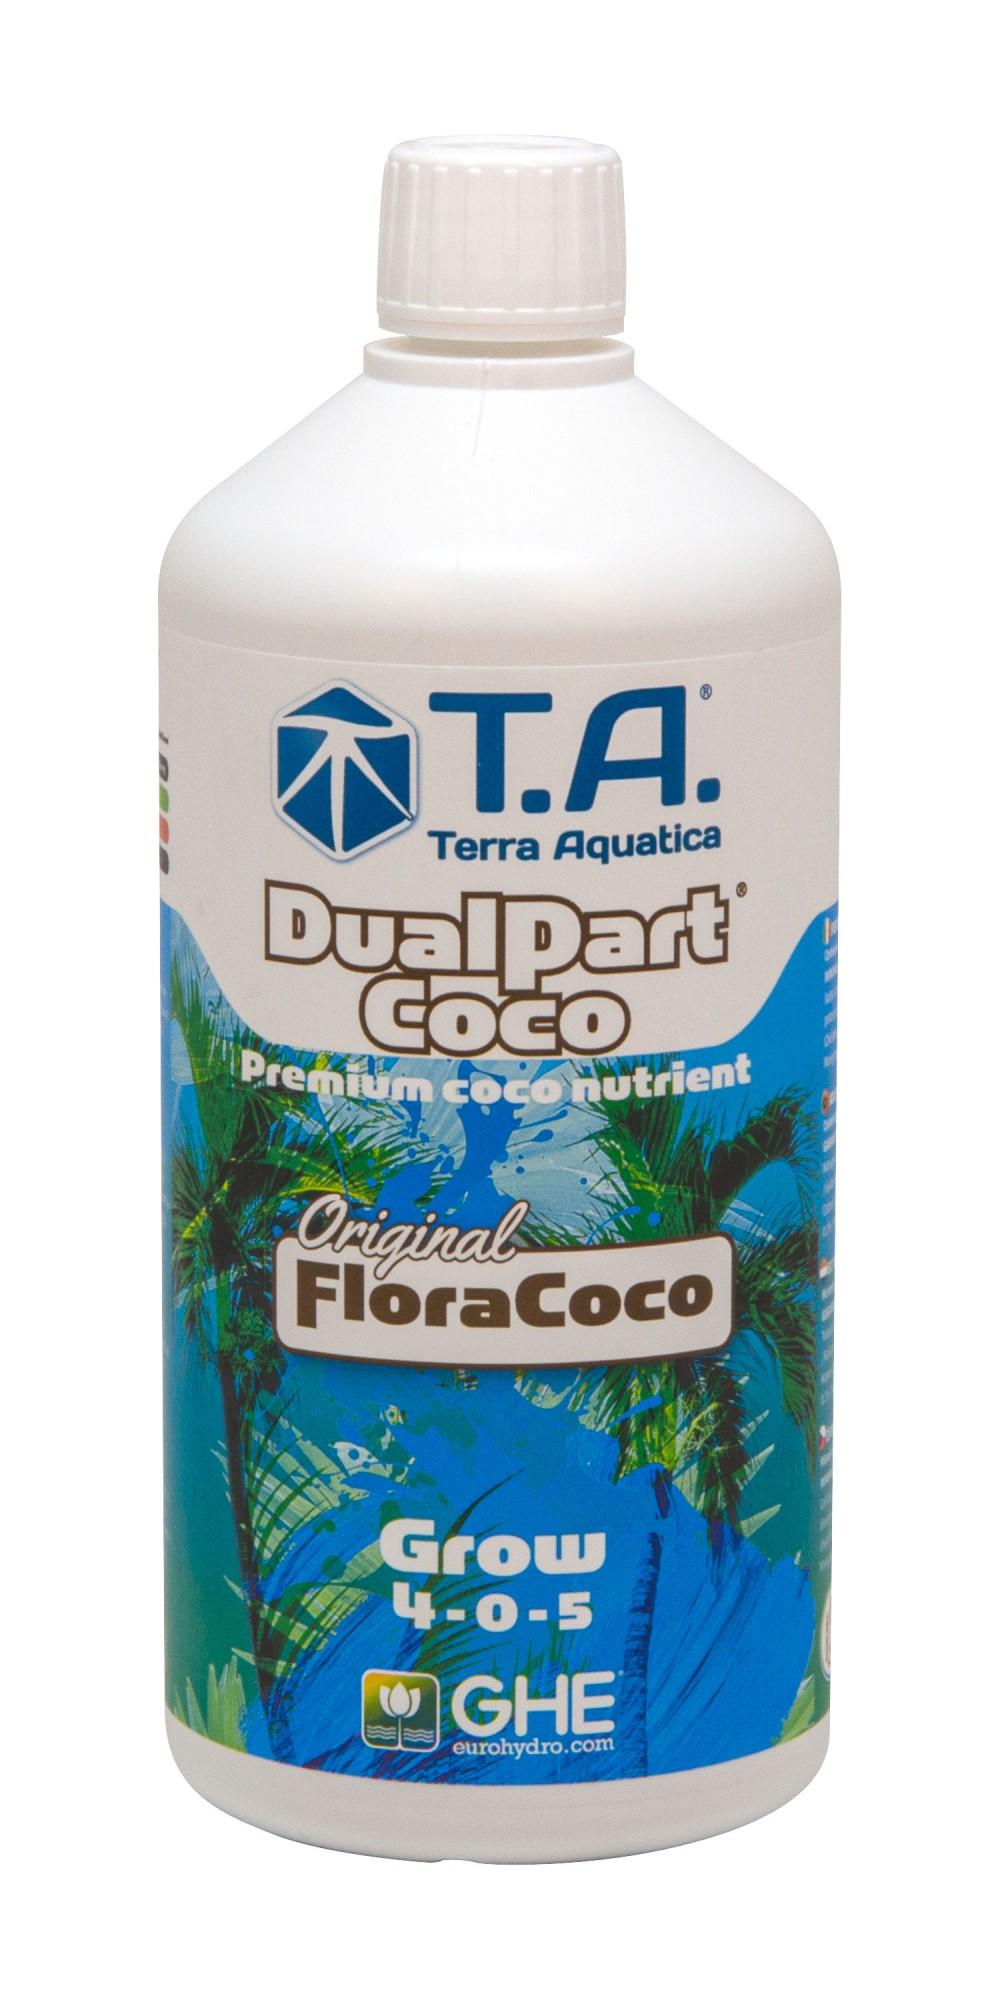 GHE FloraCoco Grow 1L (DualPart Coco Grow)